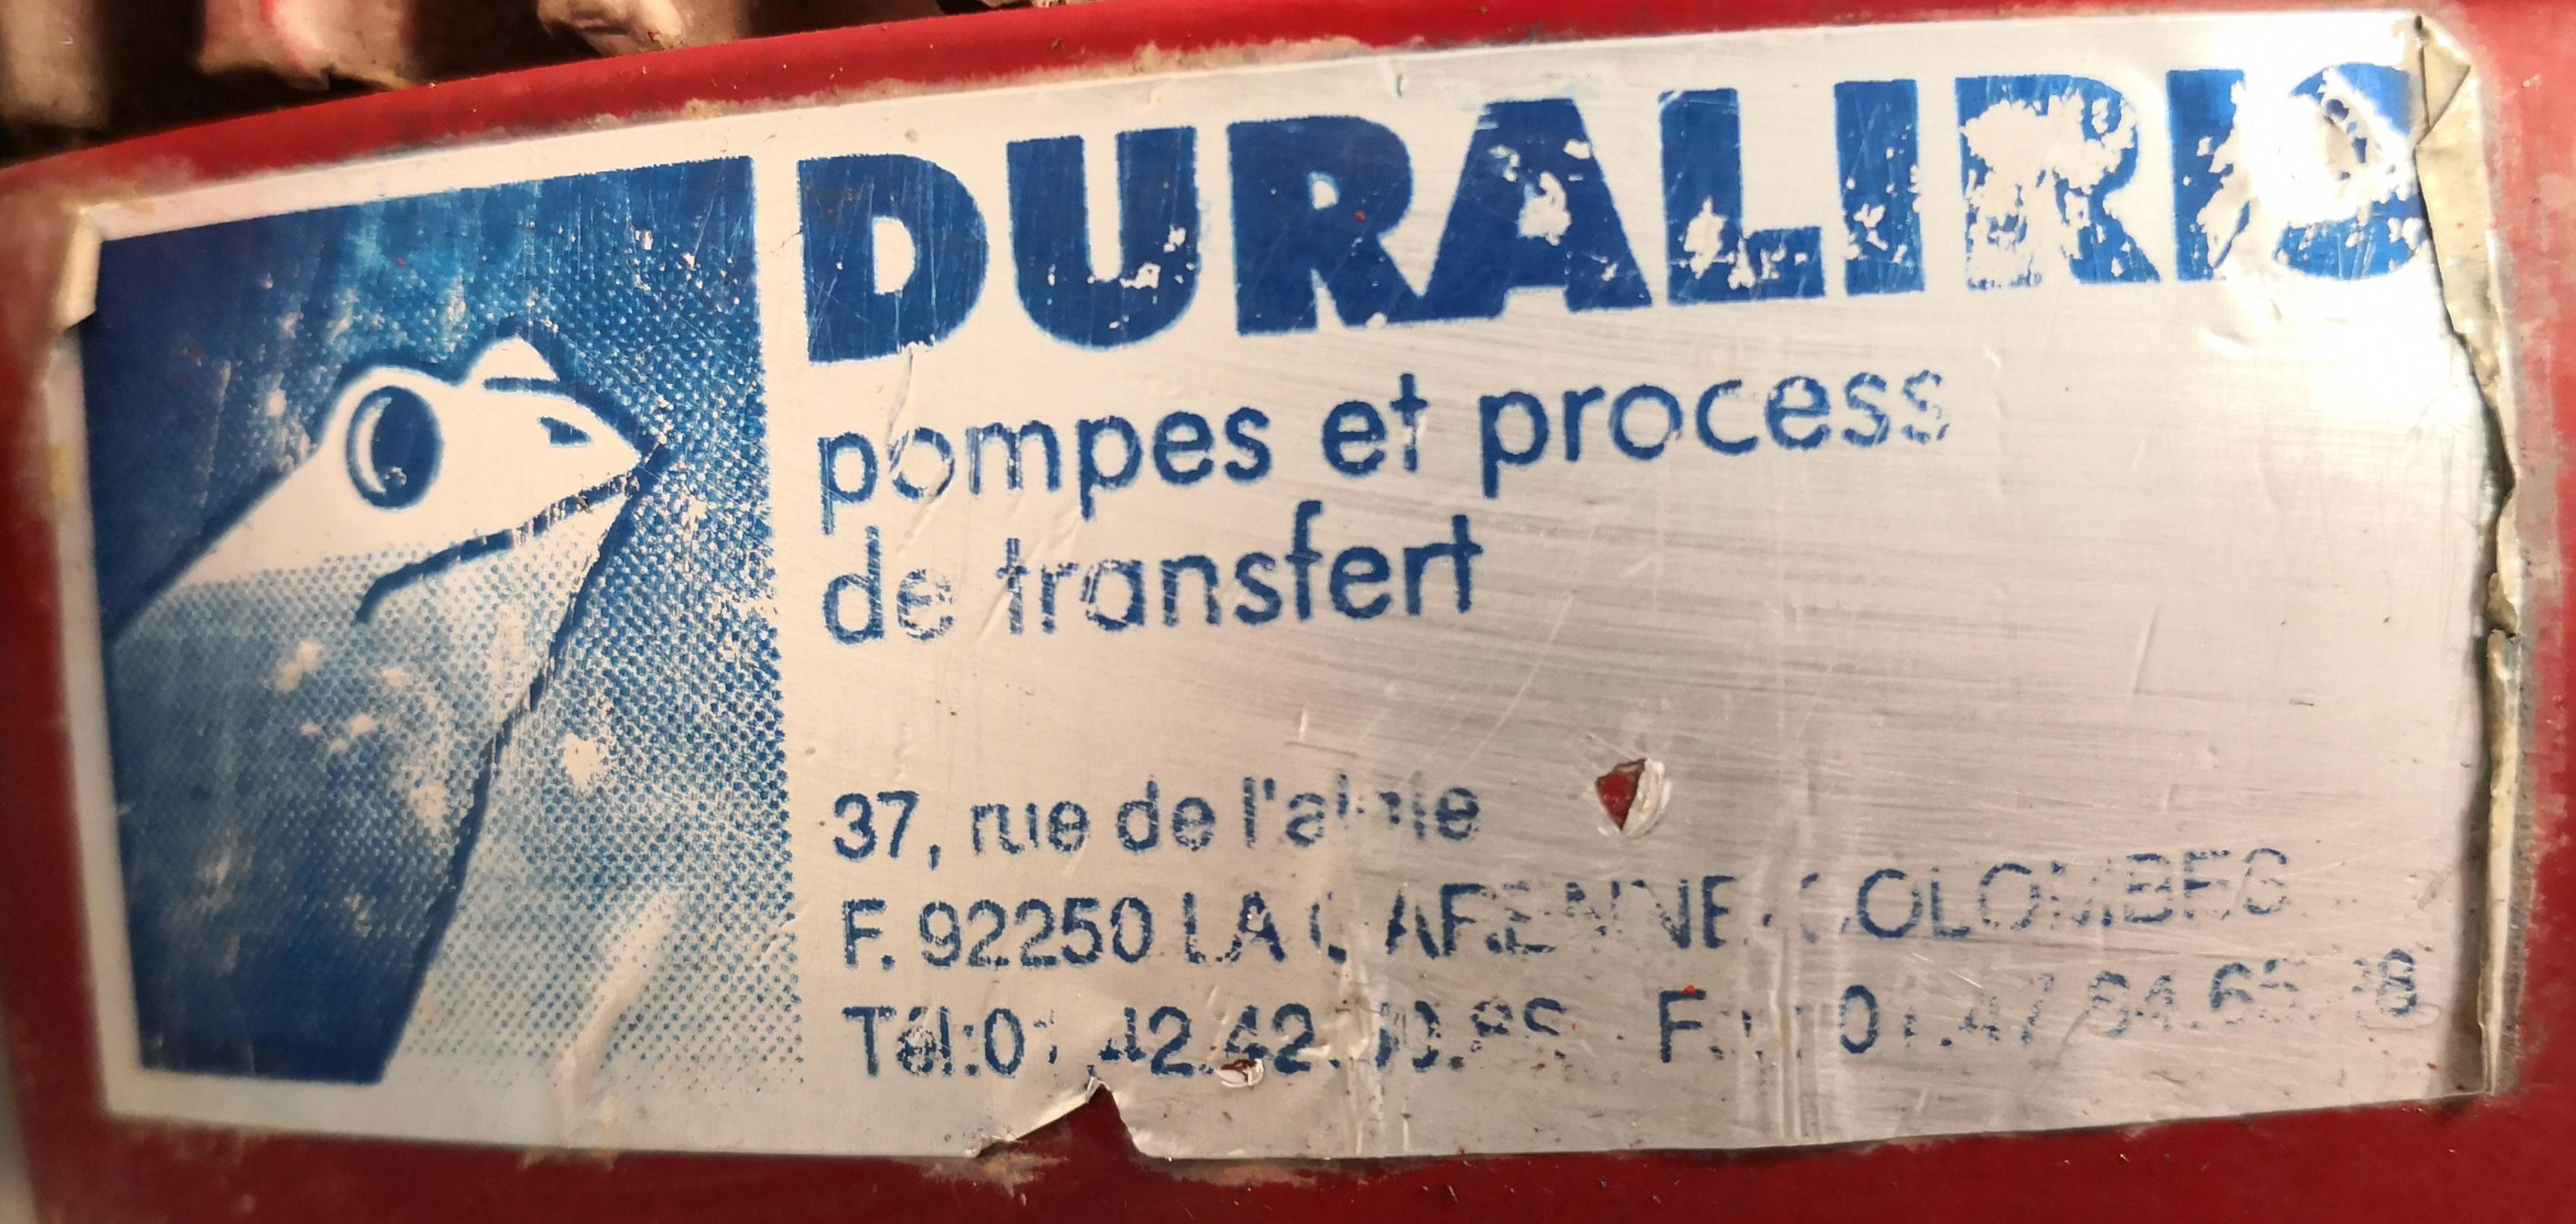 POMPA GIRANTE FLESSIBILE – DURALIRIS – IRFLEX (POM-124) in vendita - foto 7